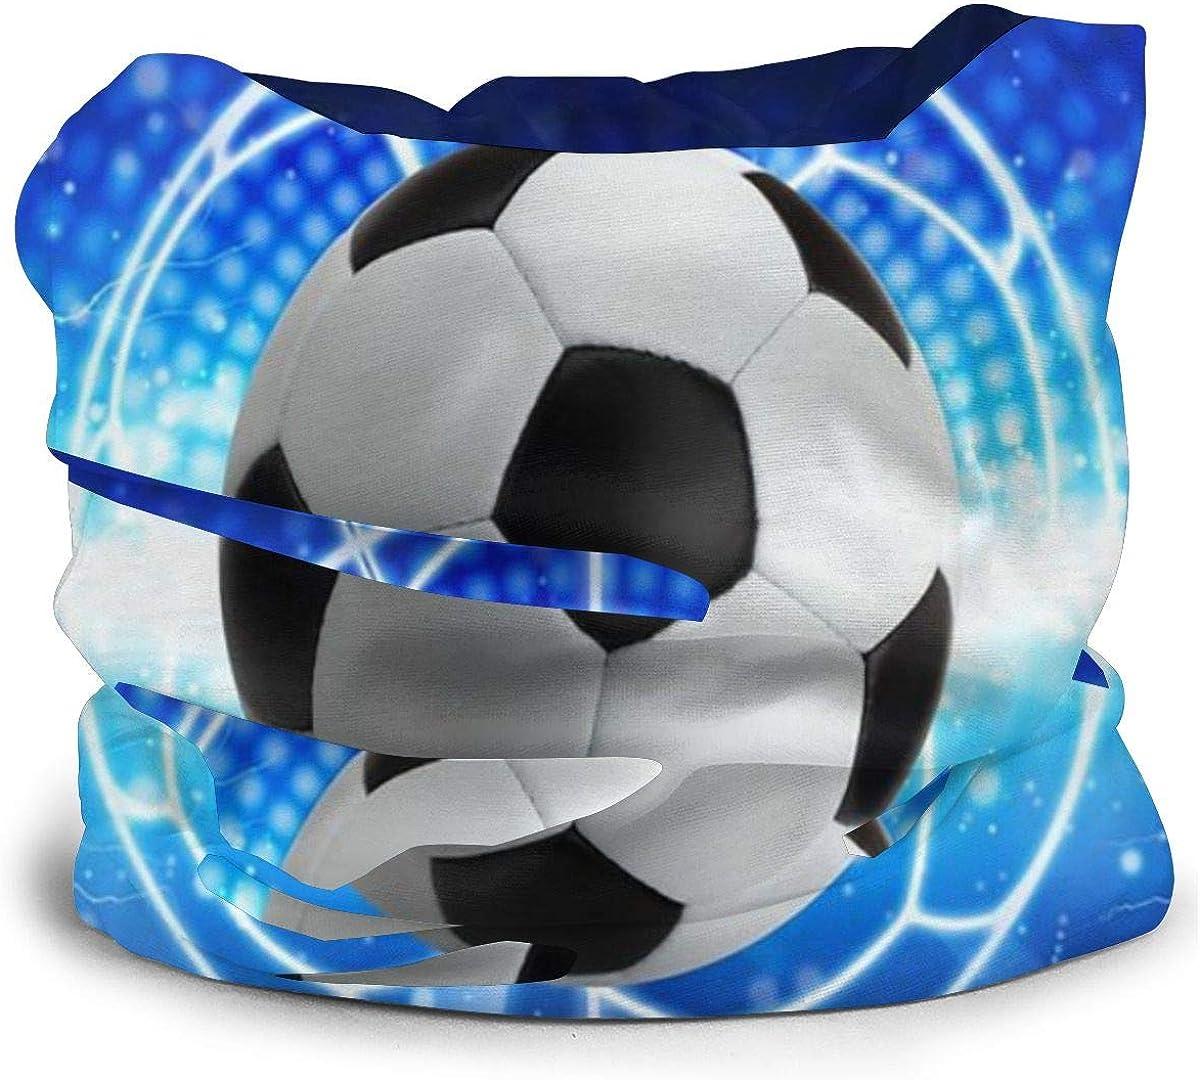 KiuLoam Bandanas Face Mask, Abstract Soccer Ball Print Neck Gaiter Mask Headband for Men Women Face Scarf Dust, Outdoors, Sports